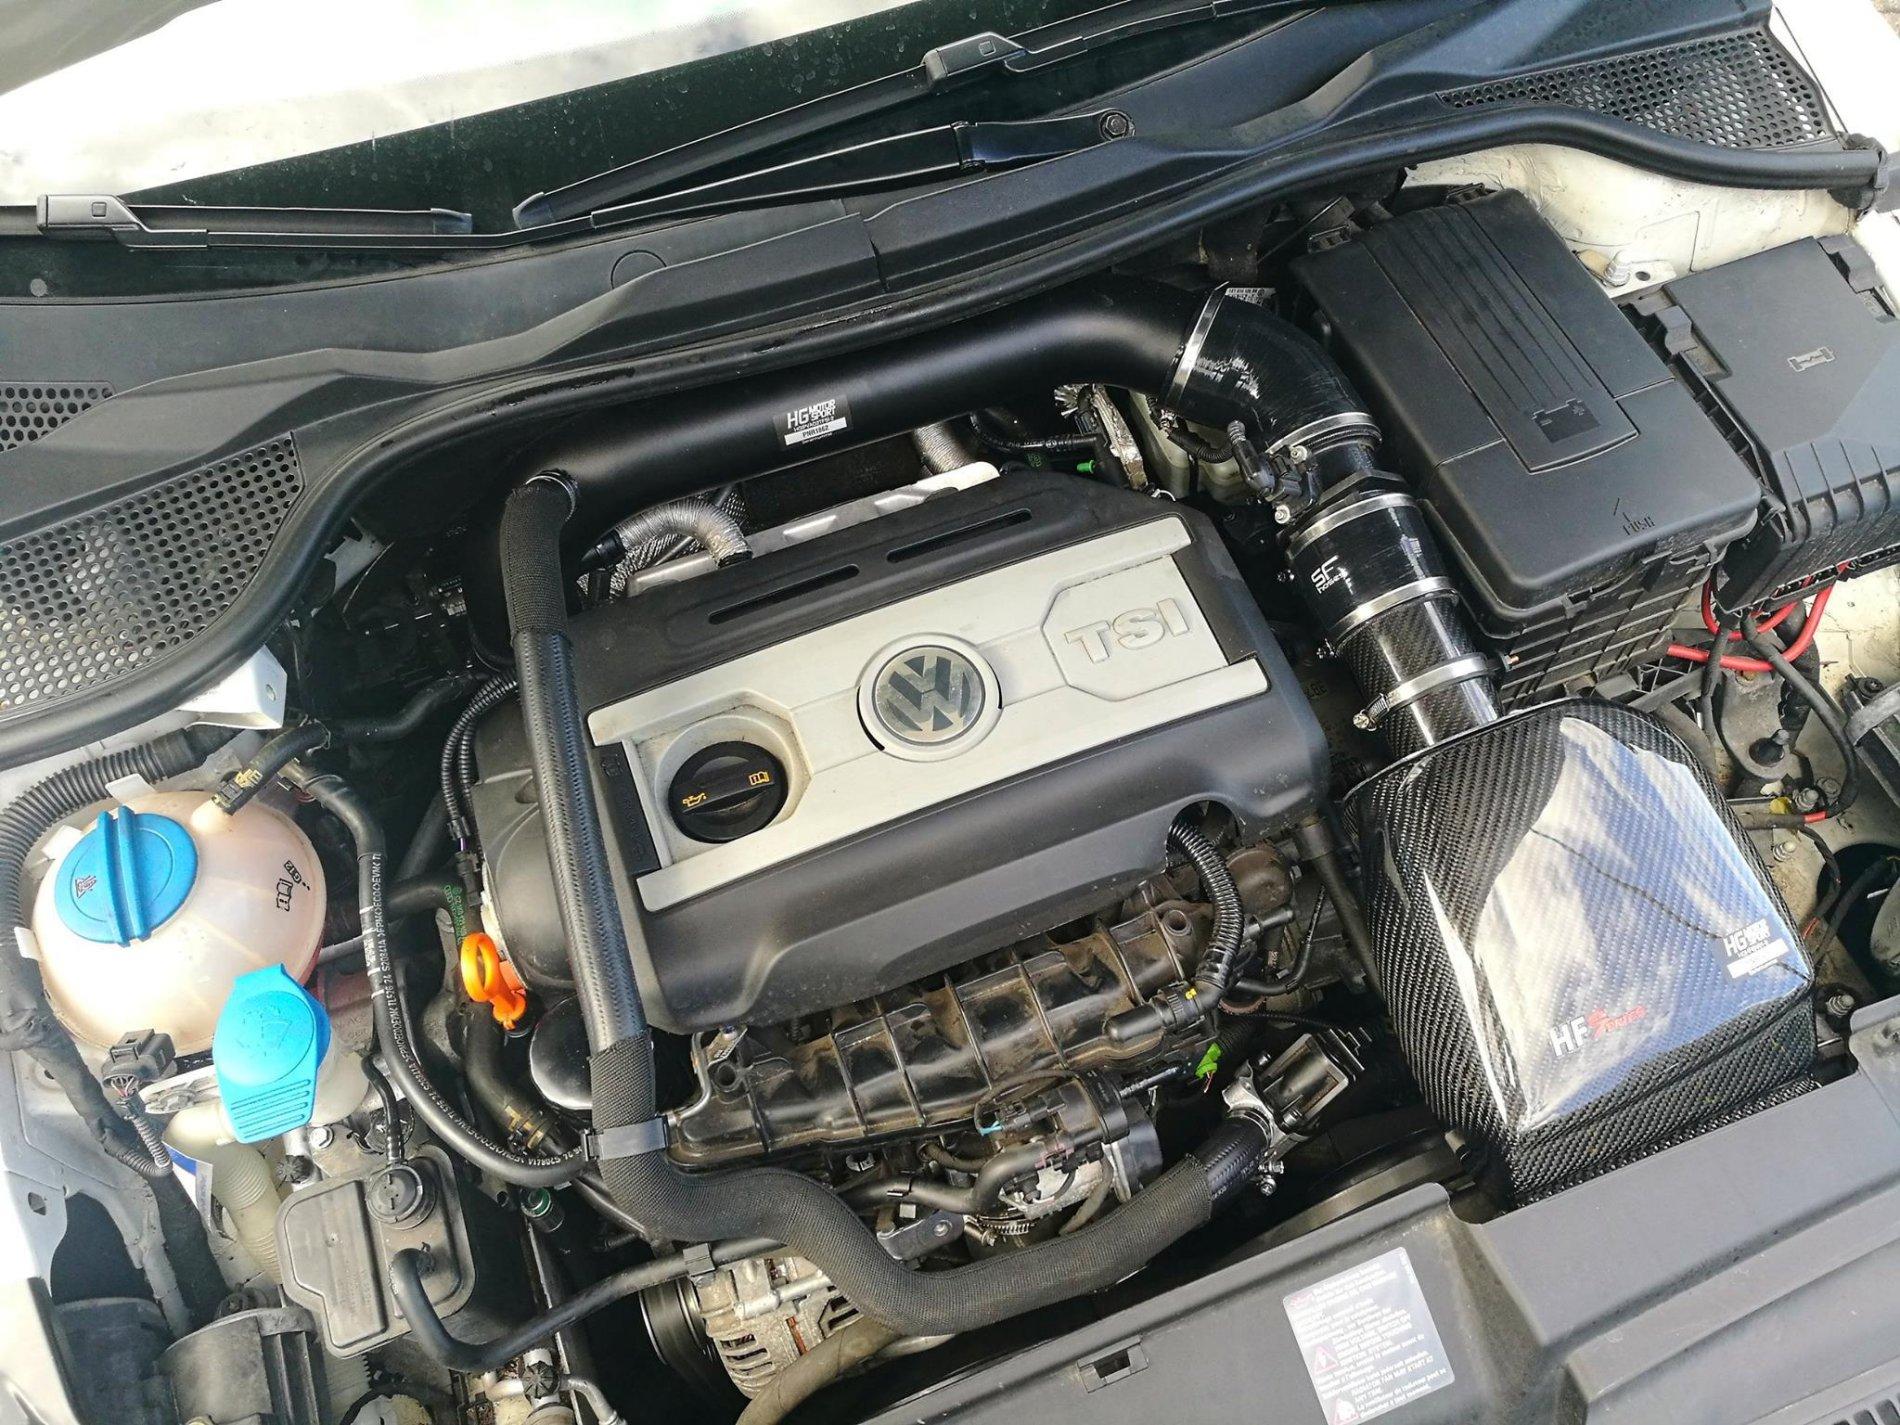 VW Scirocco de la B&B - VW Scirocco de la B&B